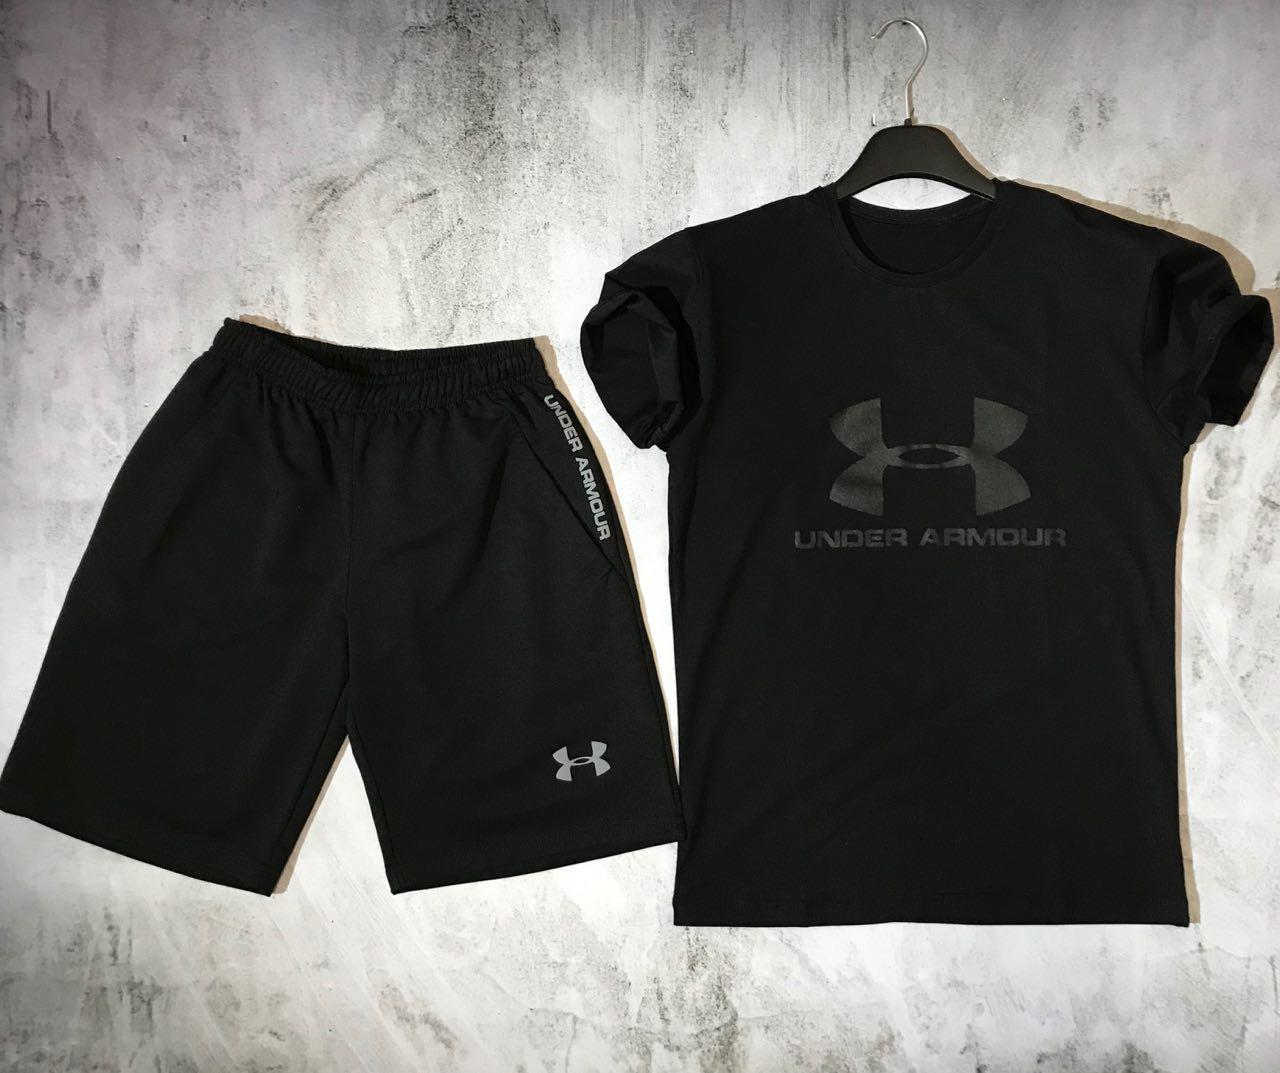 Мужской спортивный костюм (футболка и шорты) Under Armour The Dark Knight